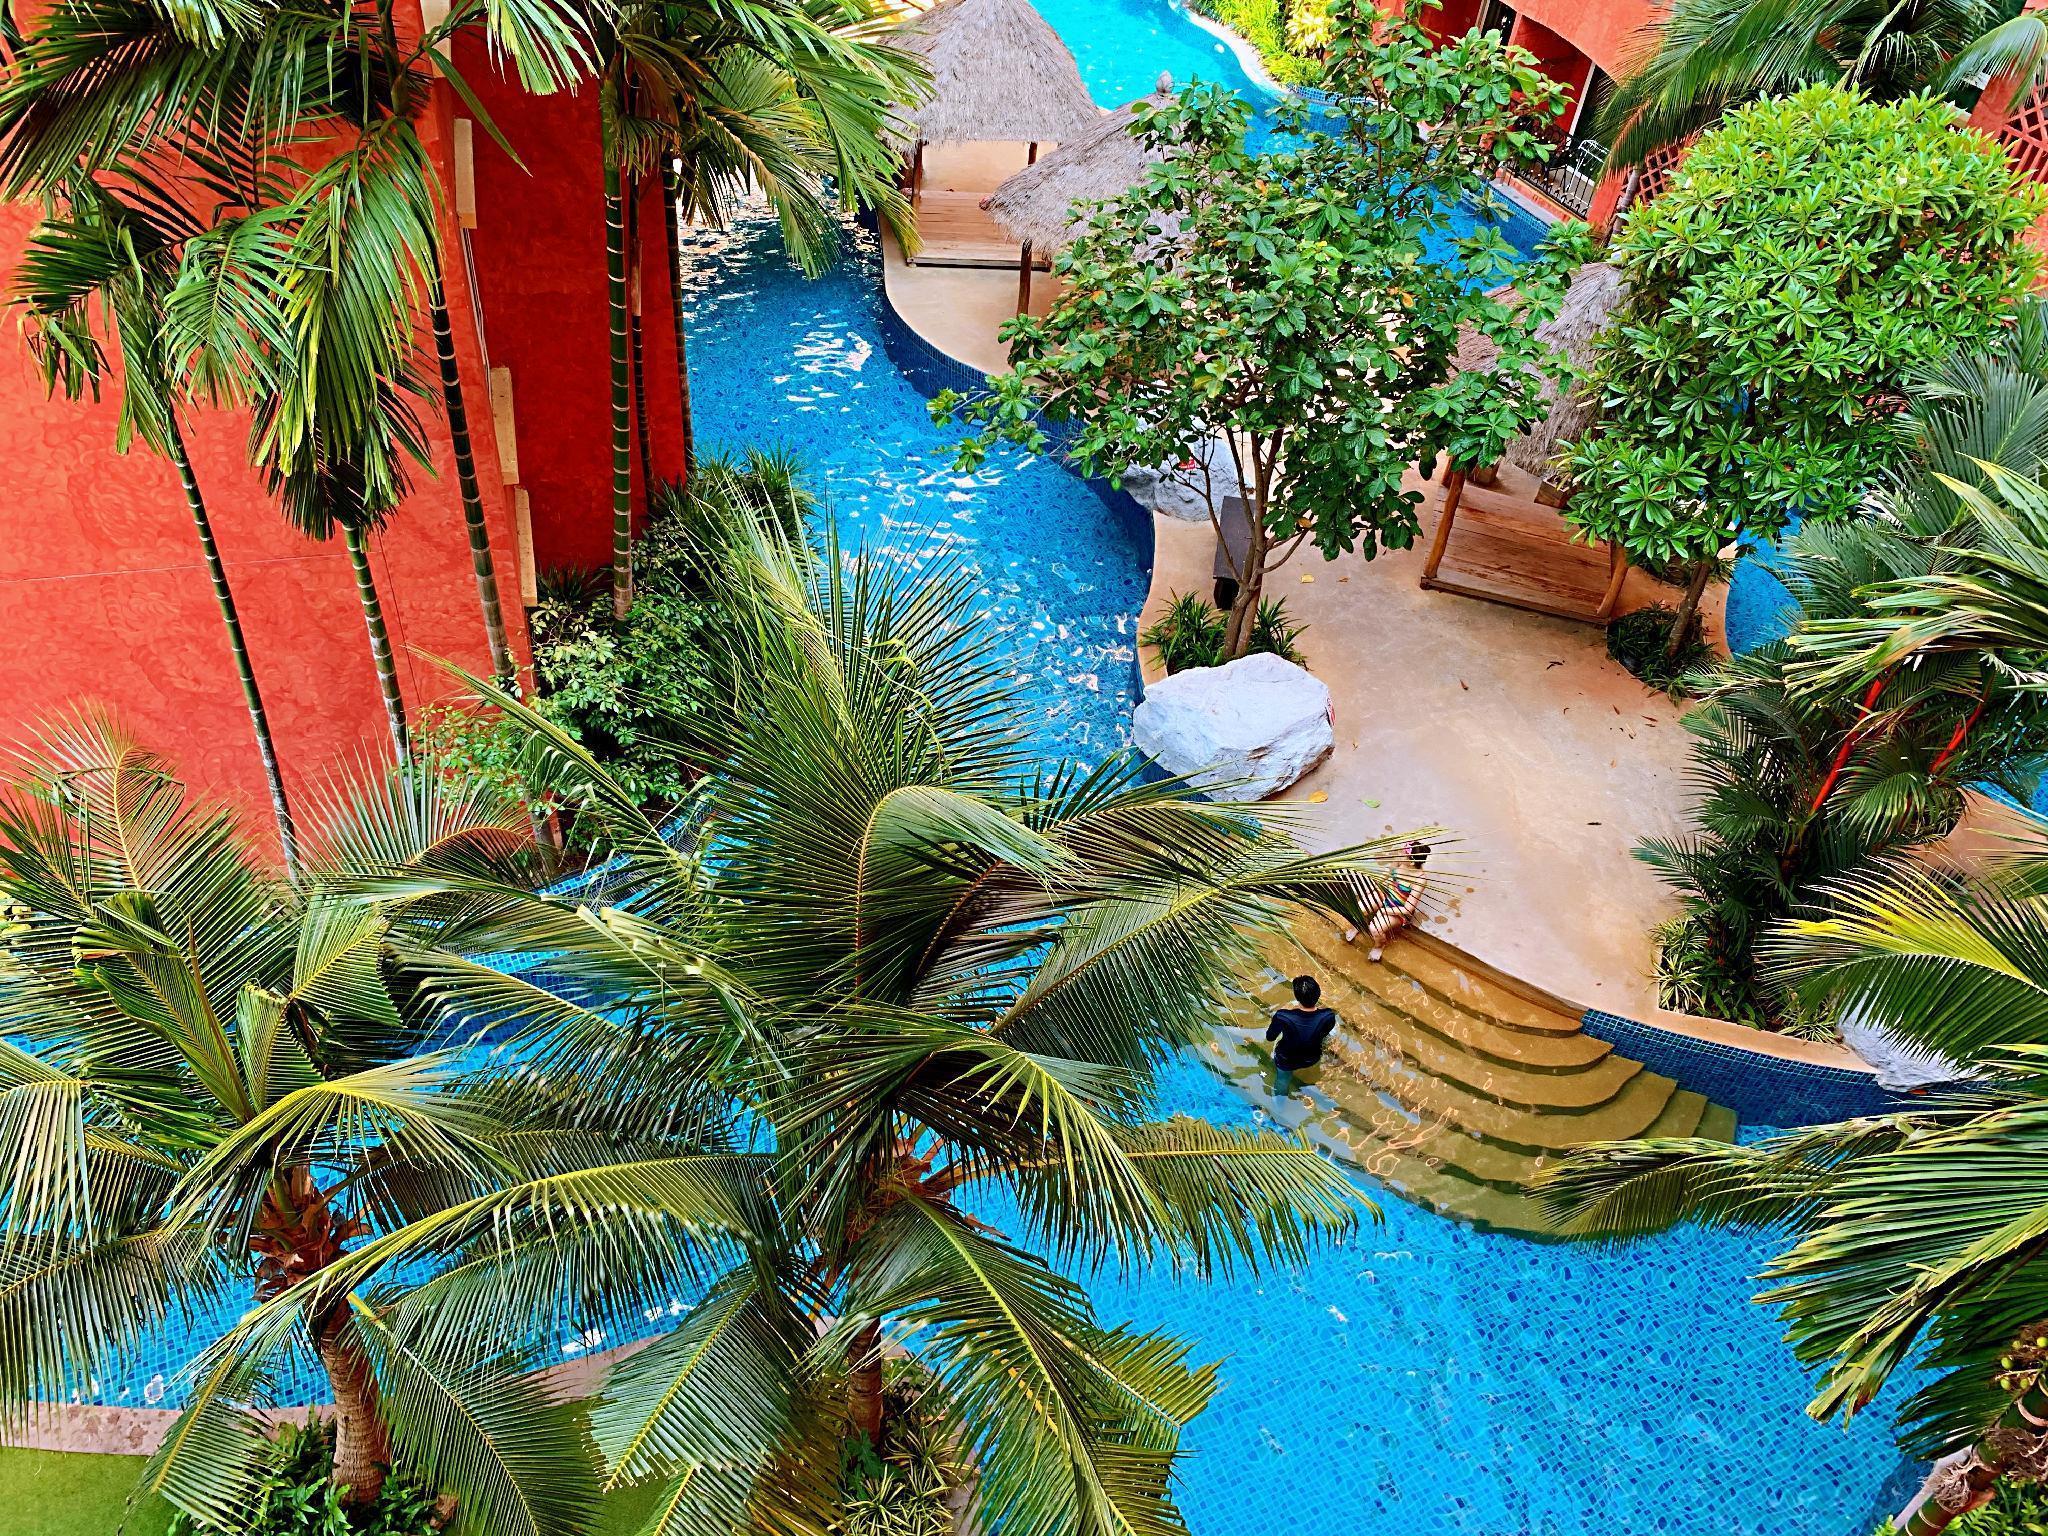 Seven Seas Condominium surrounded by swimming pool อพาร์ตเมนต์ 1 ห้องนอน 1 ห้องน้ำส่วนตัว ขนาด 35 ตร.ม. – พัทยากลาง